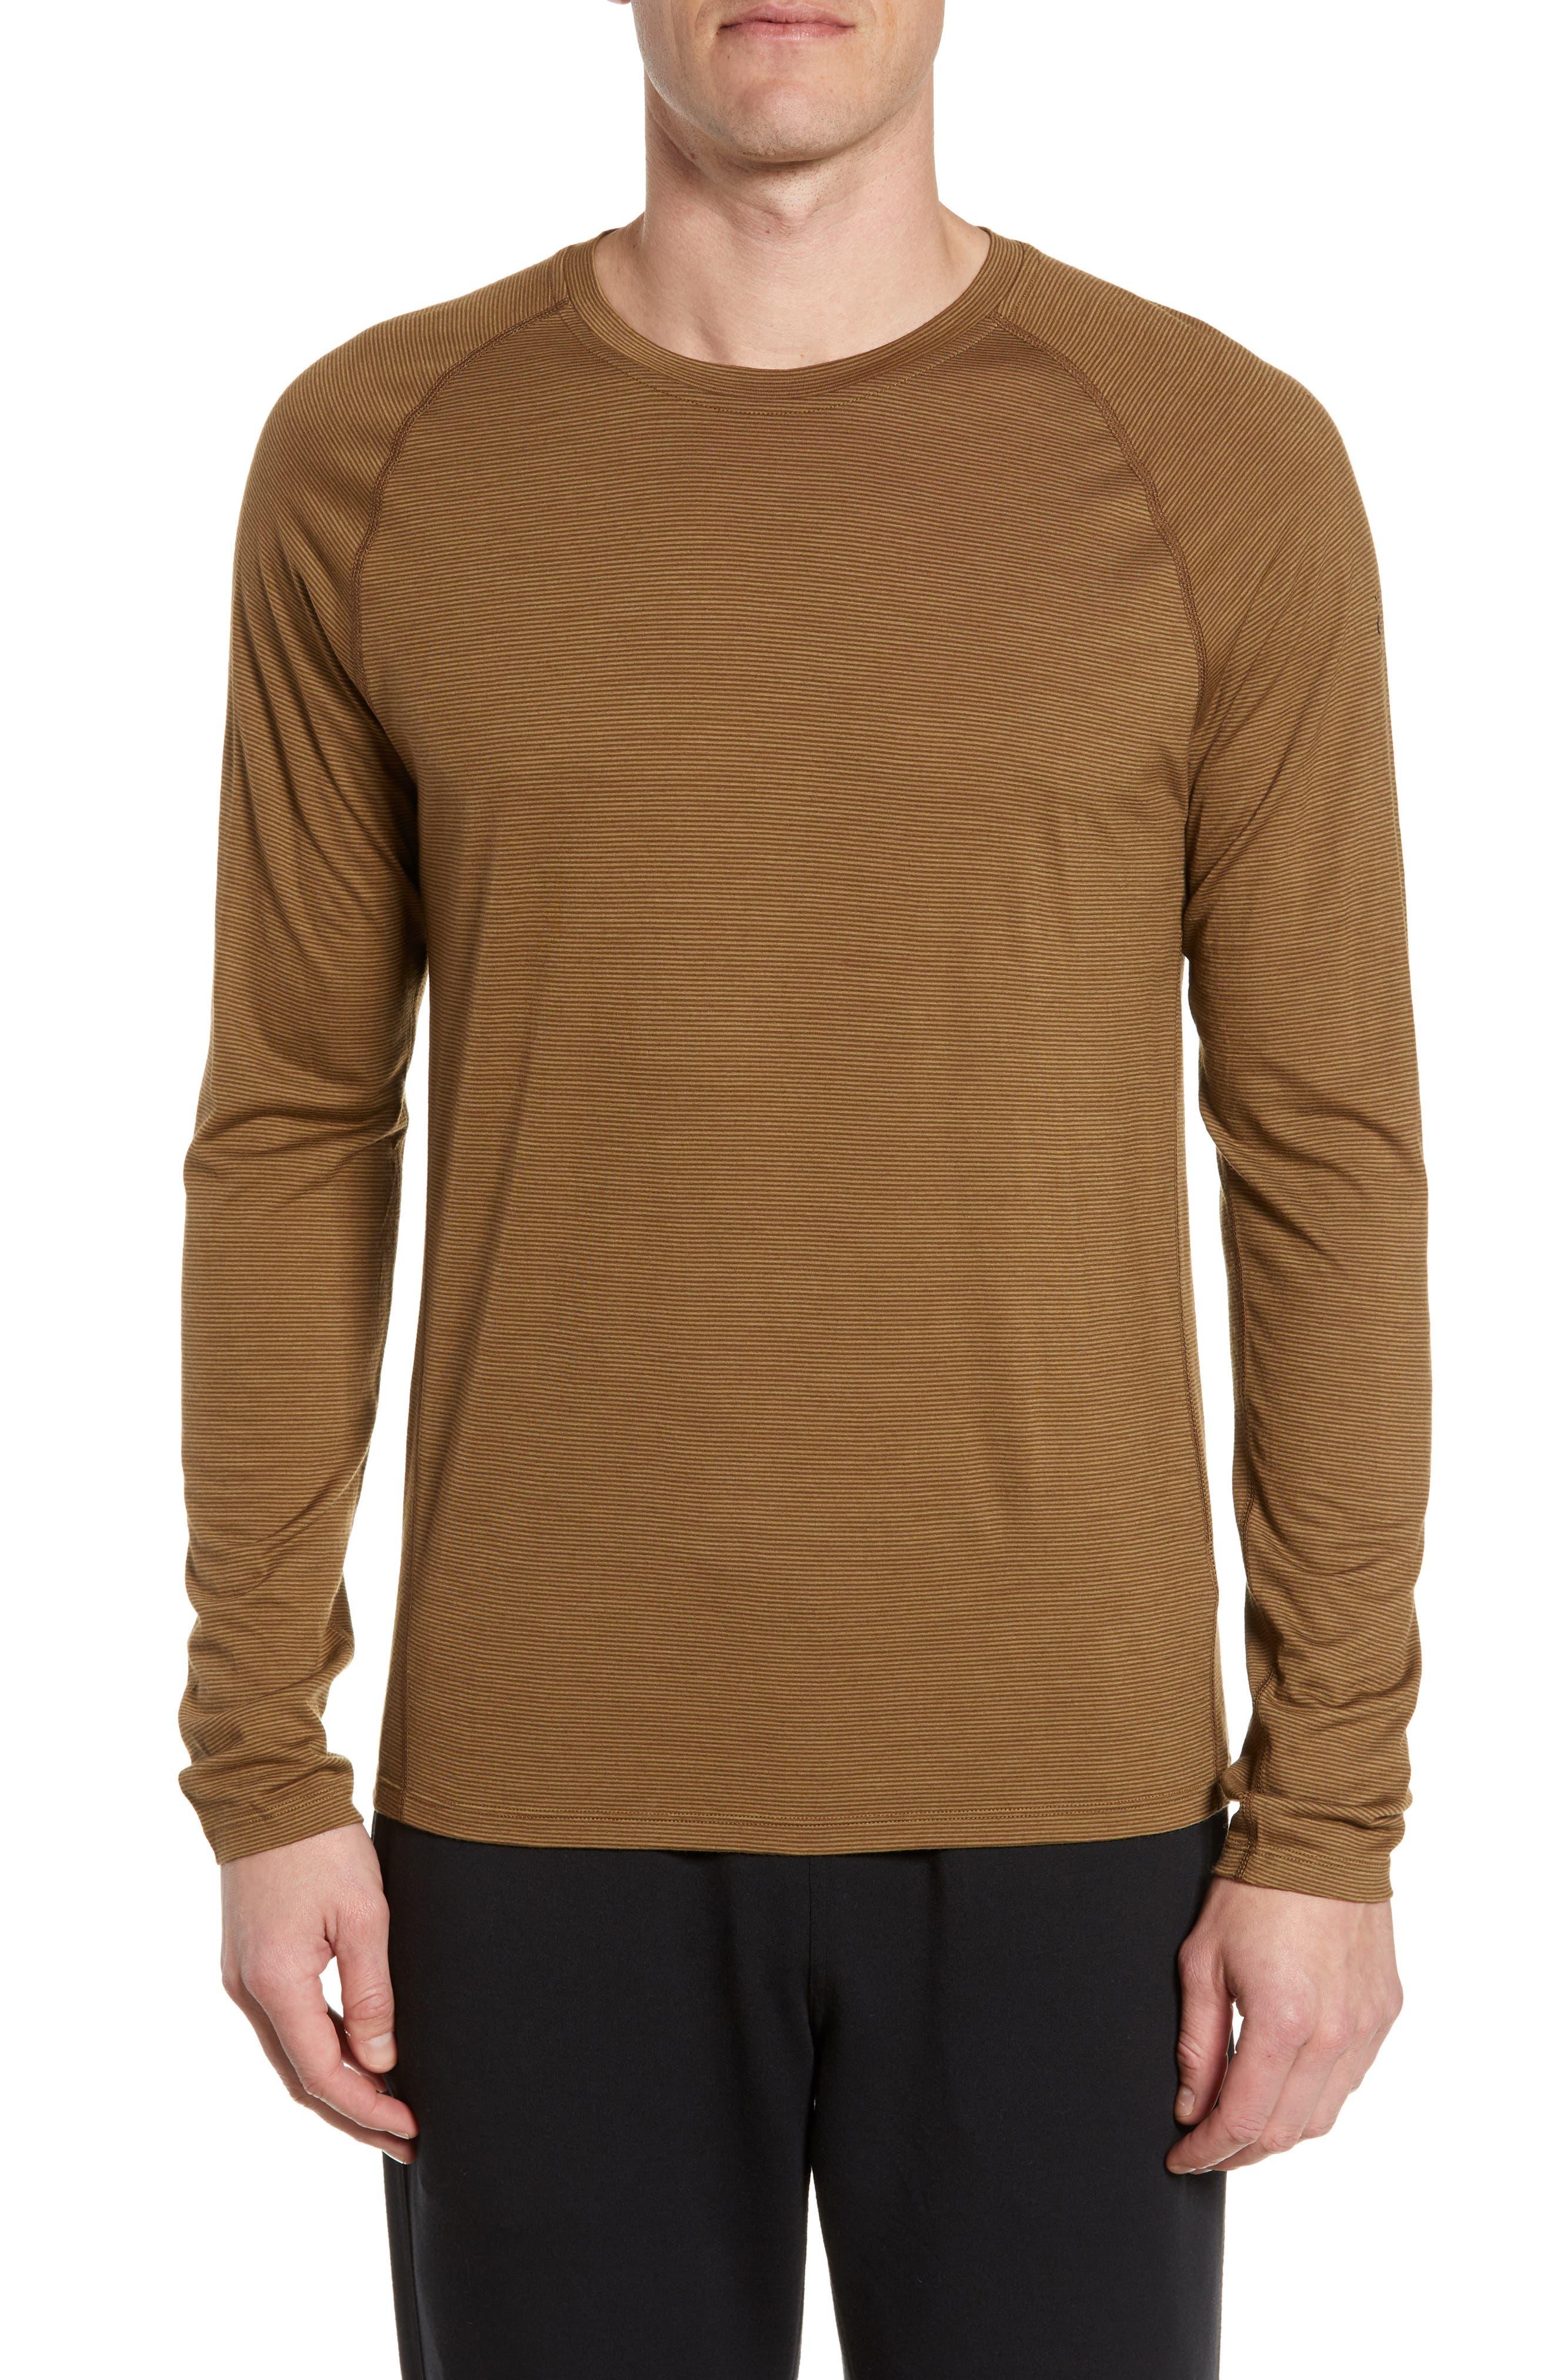 Smartwool Stripe Merino Blend T-Shirt, Brown